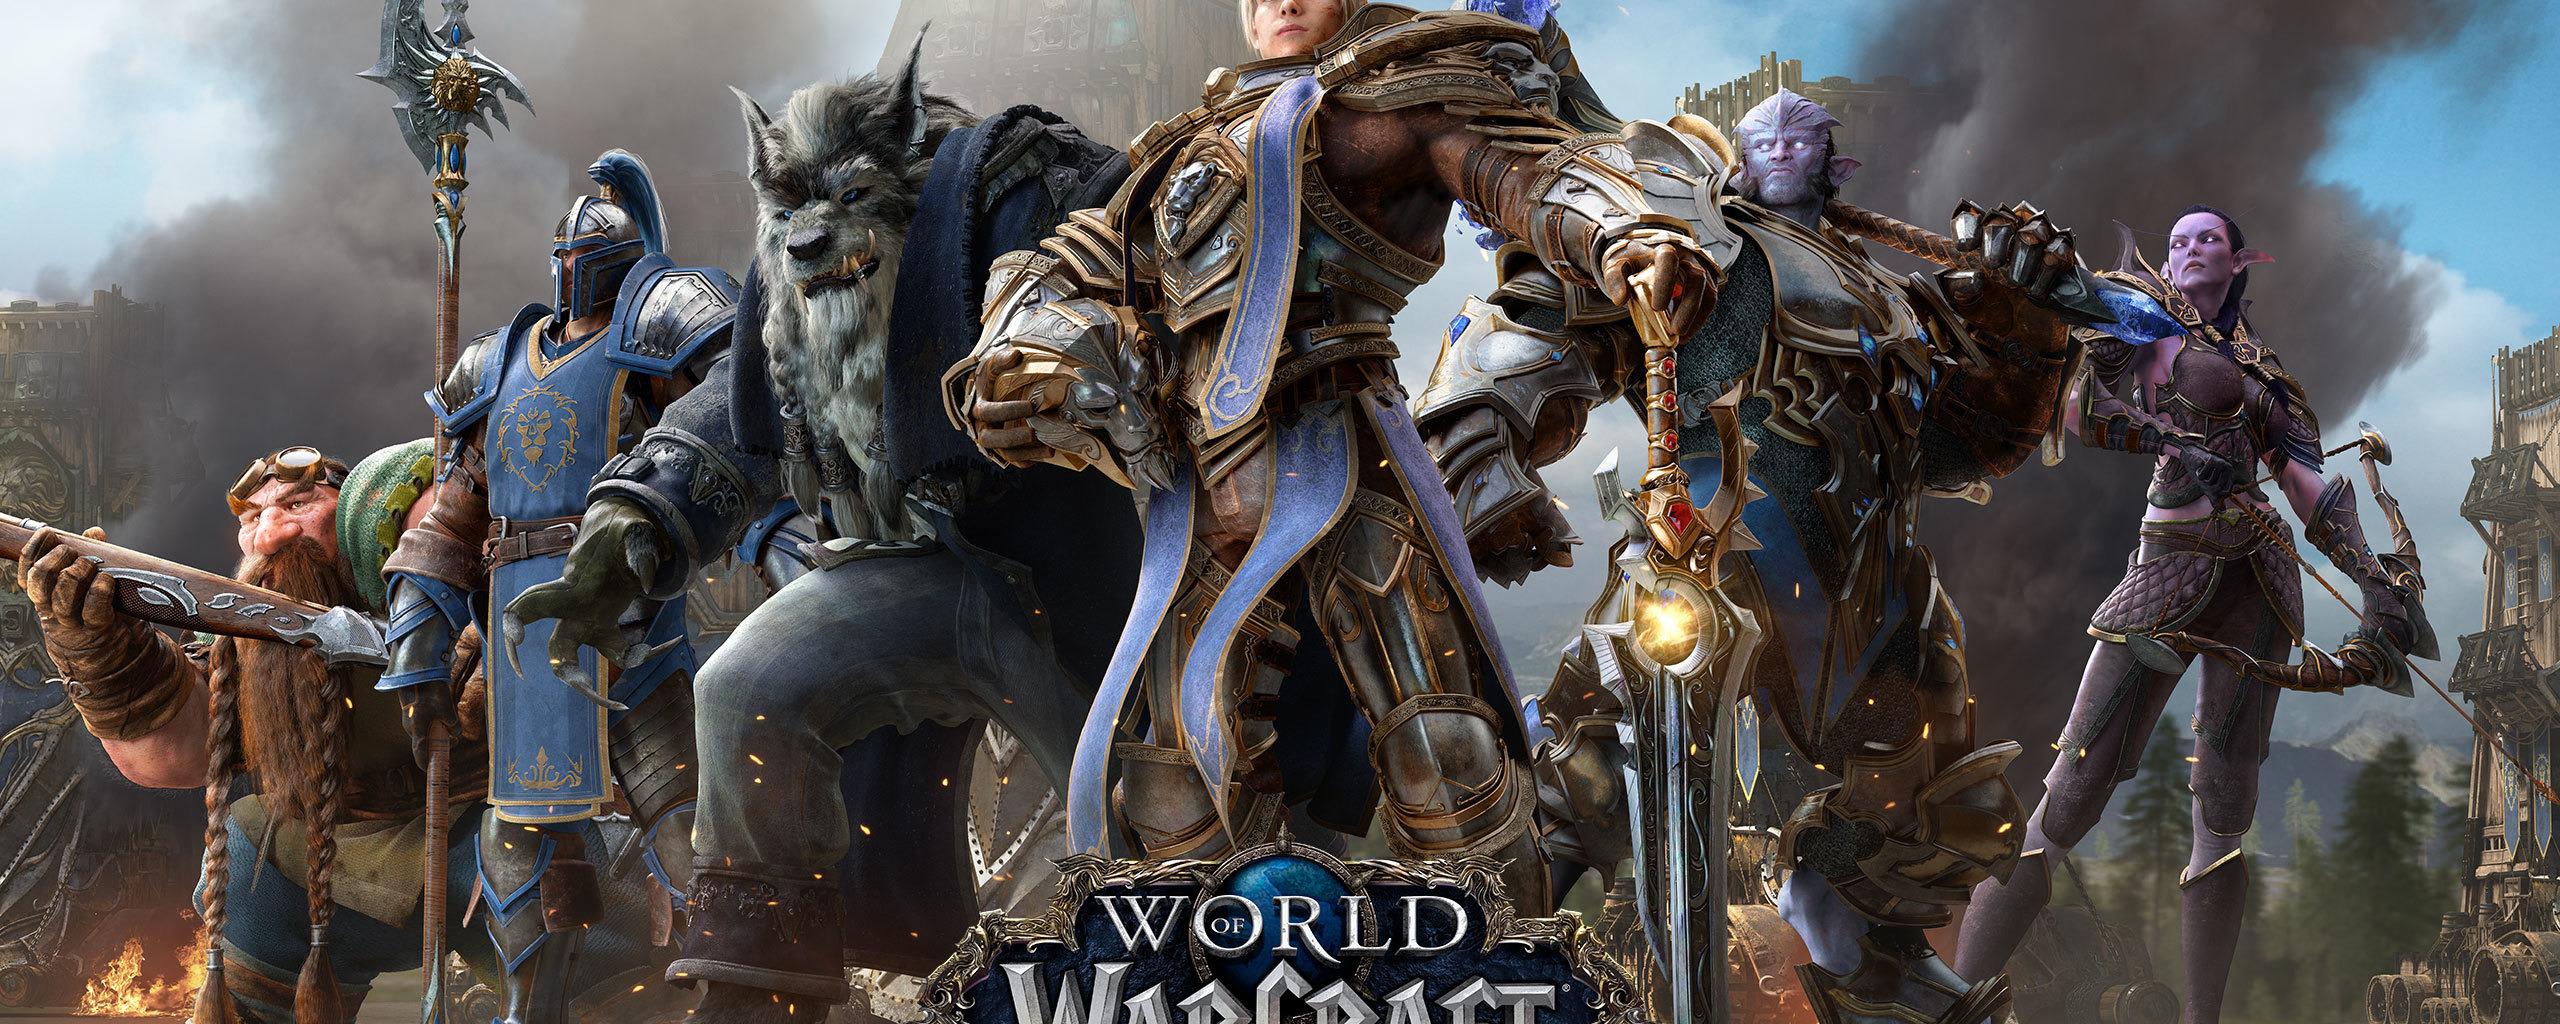 Download 2560x1024 Wallpaper World Of Warcraft Battle For